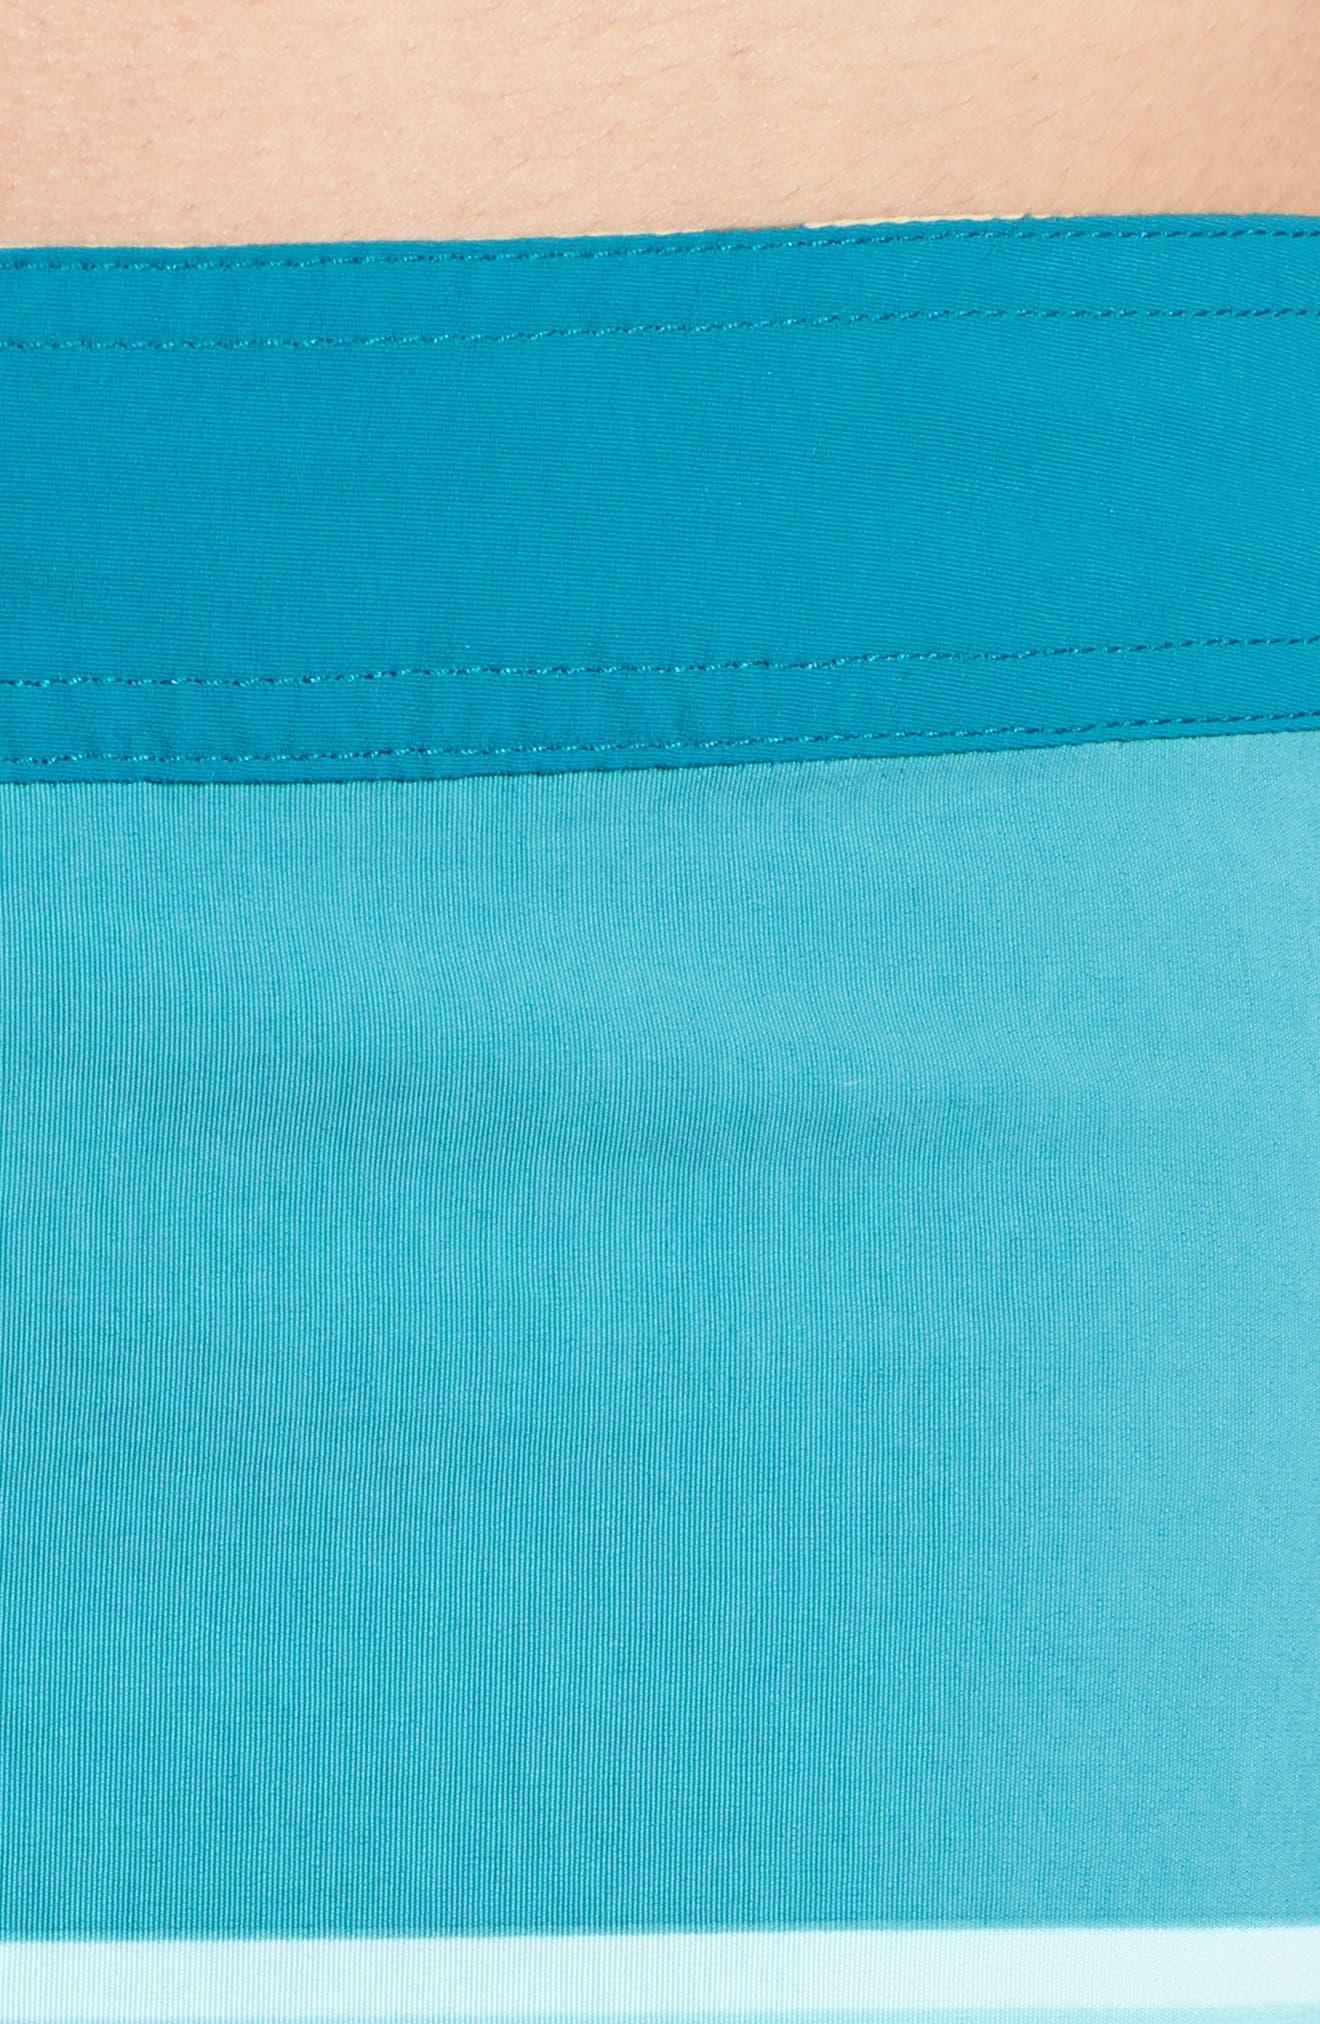 Wavefarer Board Shorts,                             Alternate thumbnail 4, color,                             Batik Hex Stripe Bend Blue